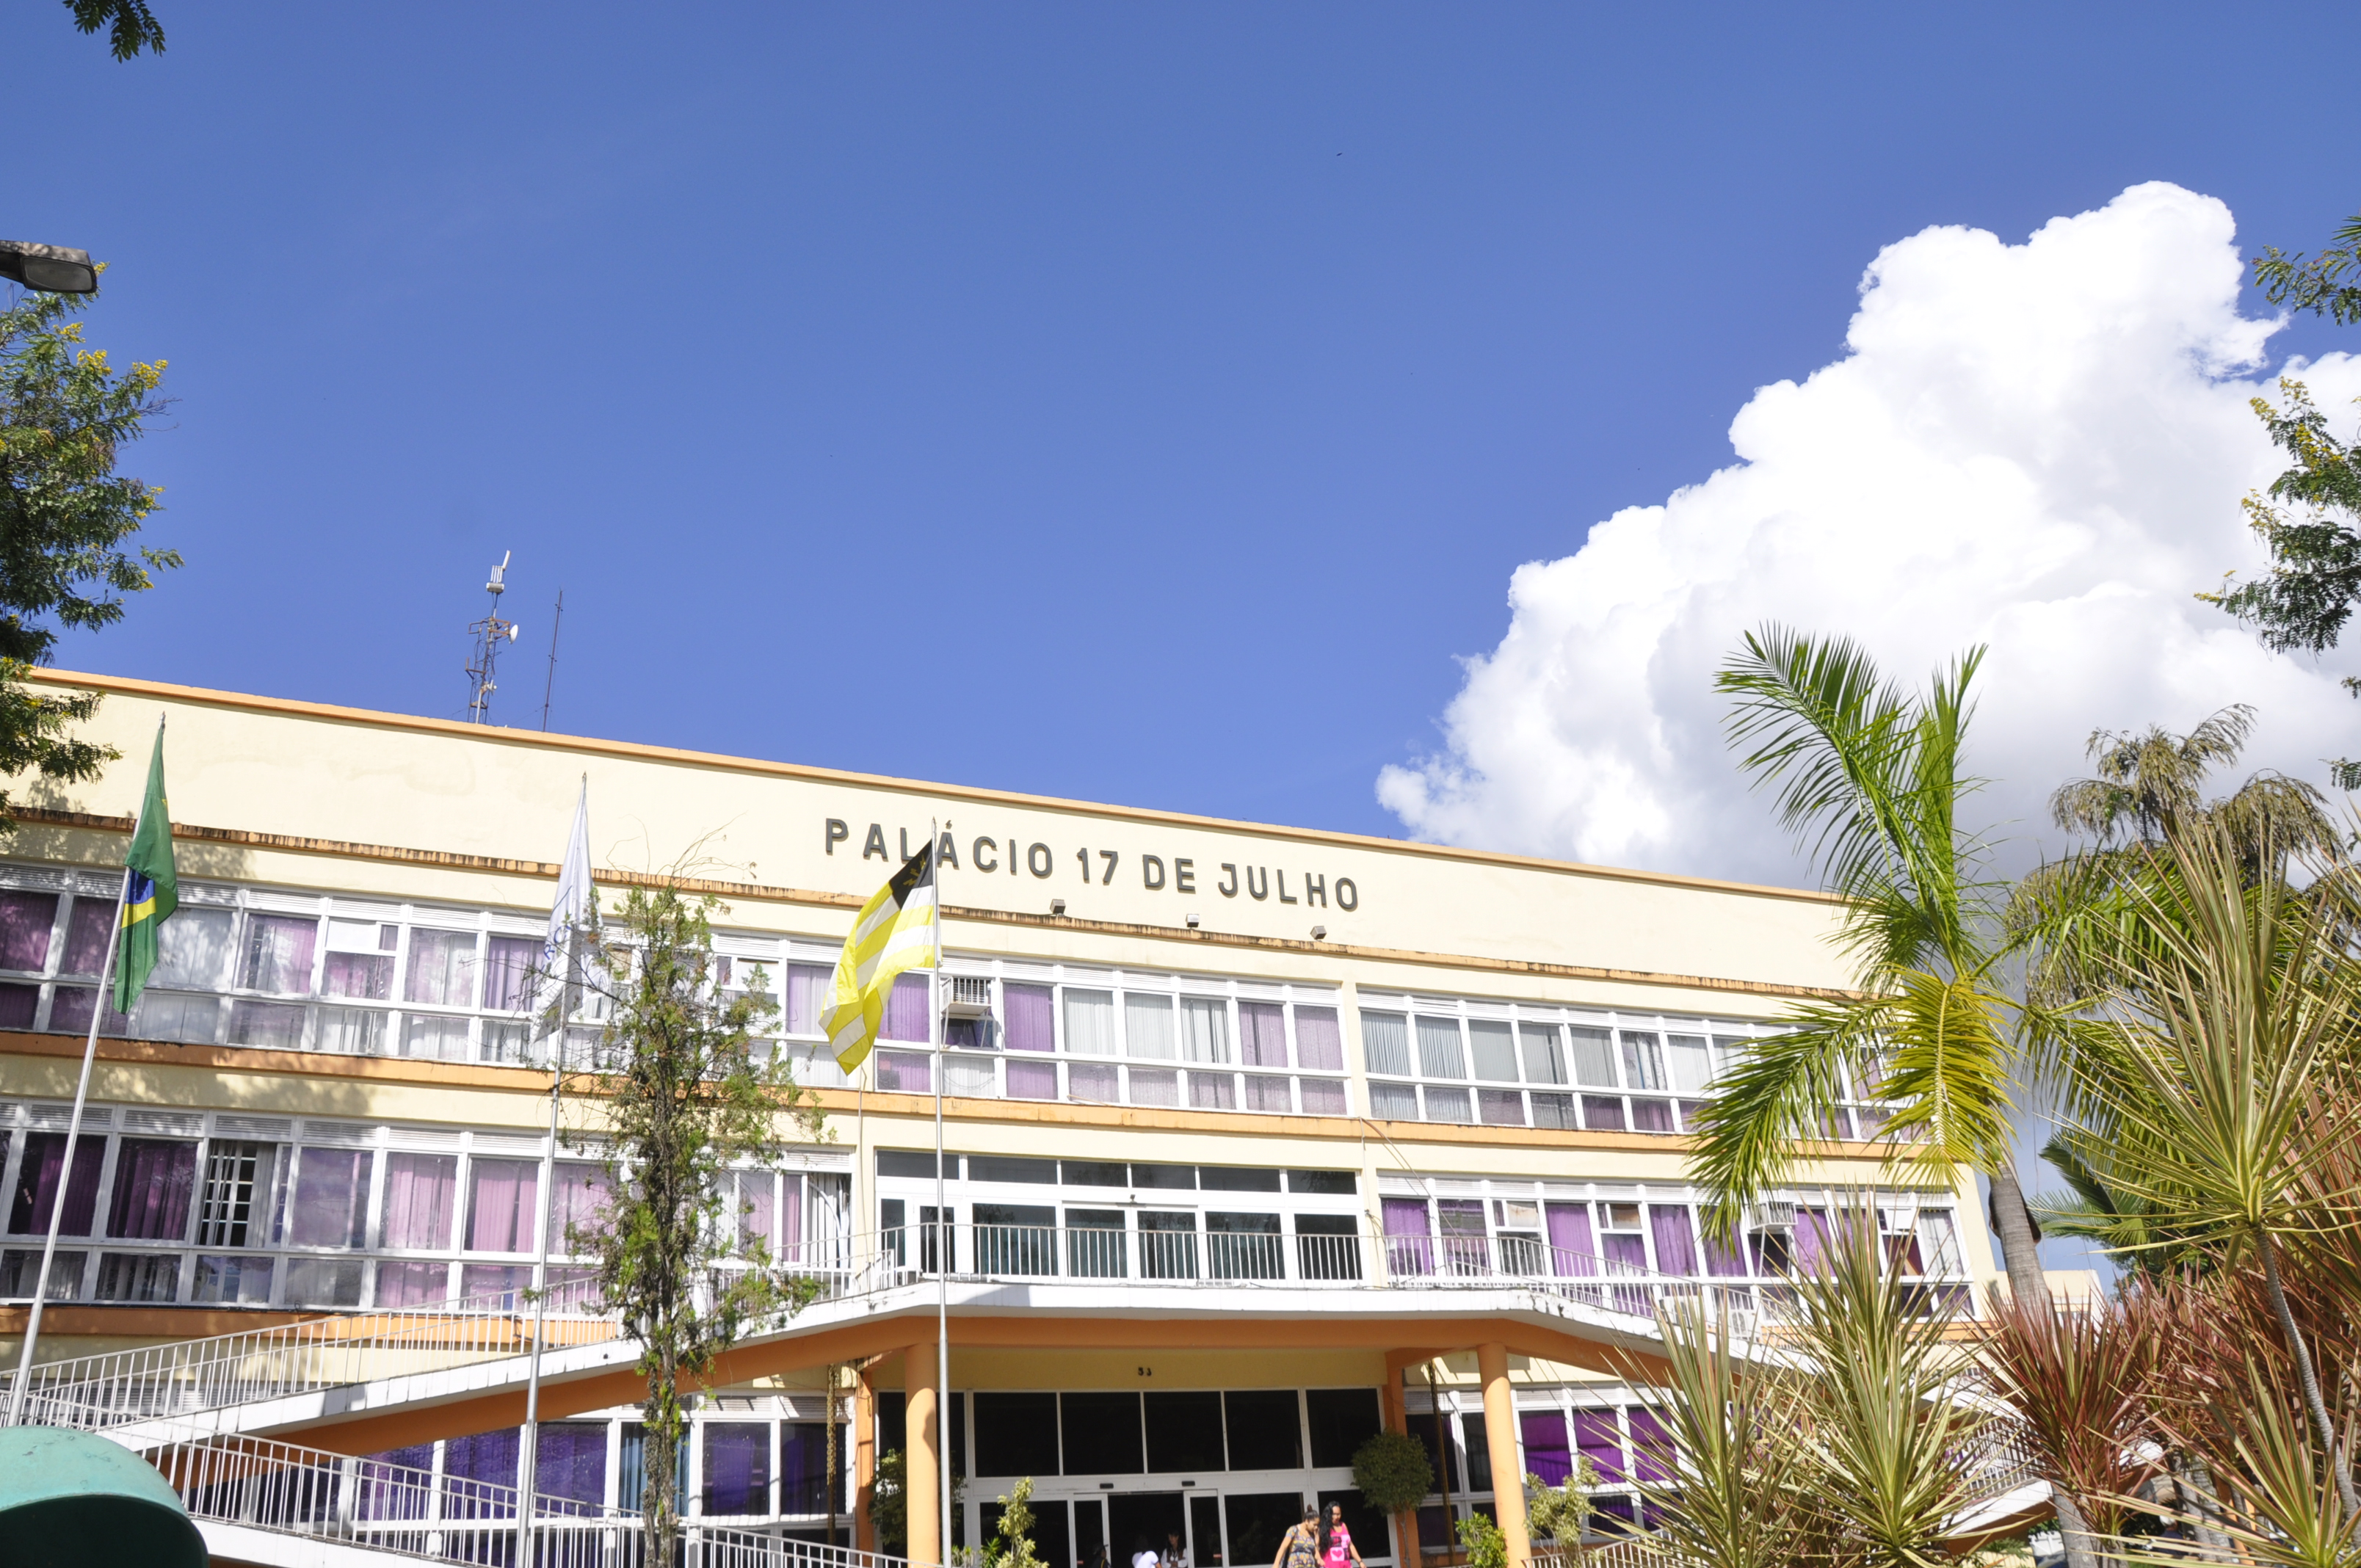 Prefeitura Municipal de Volta Redonda - Prefeitura atualiza dados sobre  coronavírus na cidade